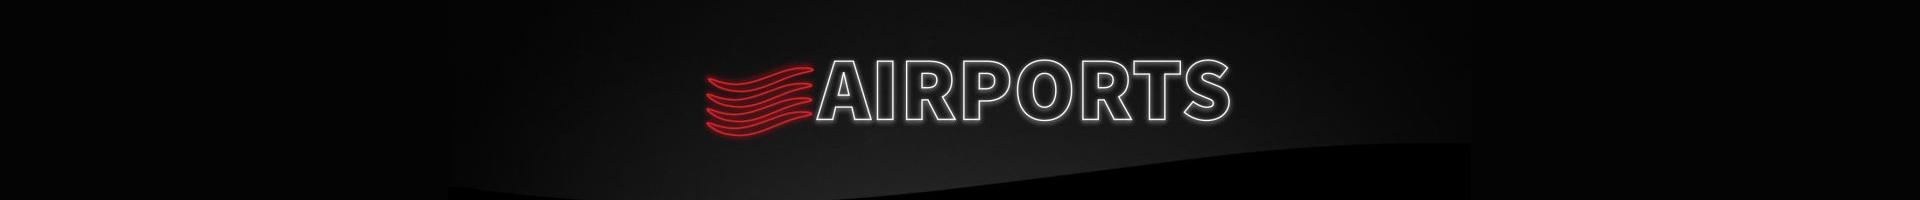 Airports Slider